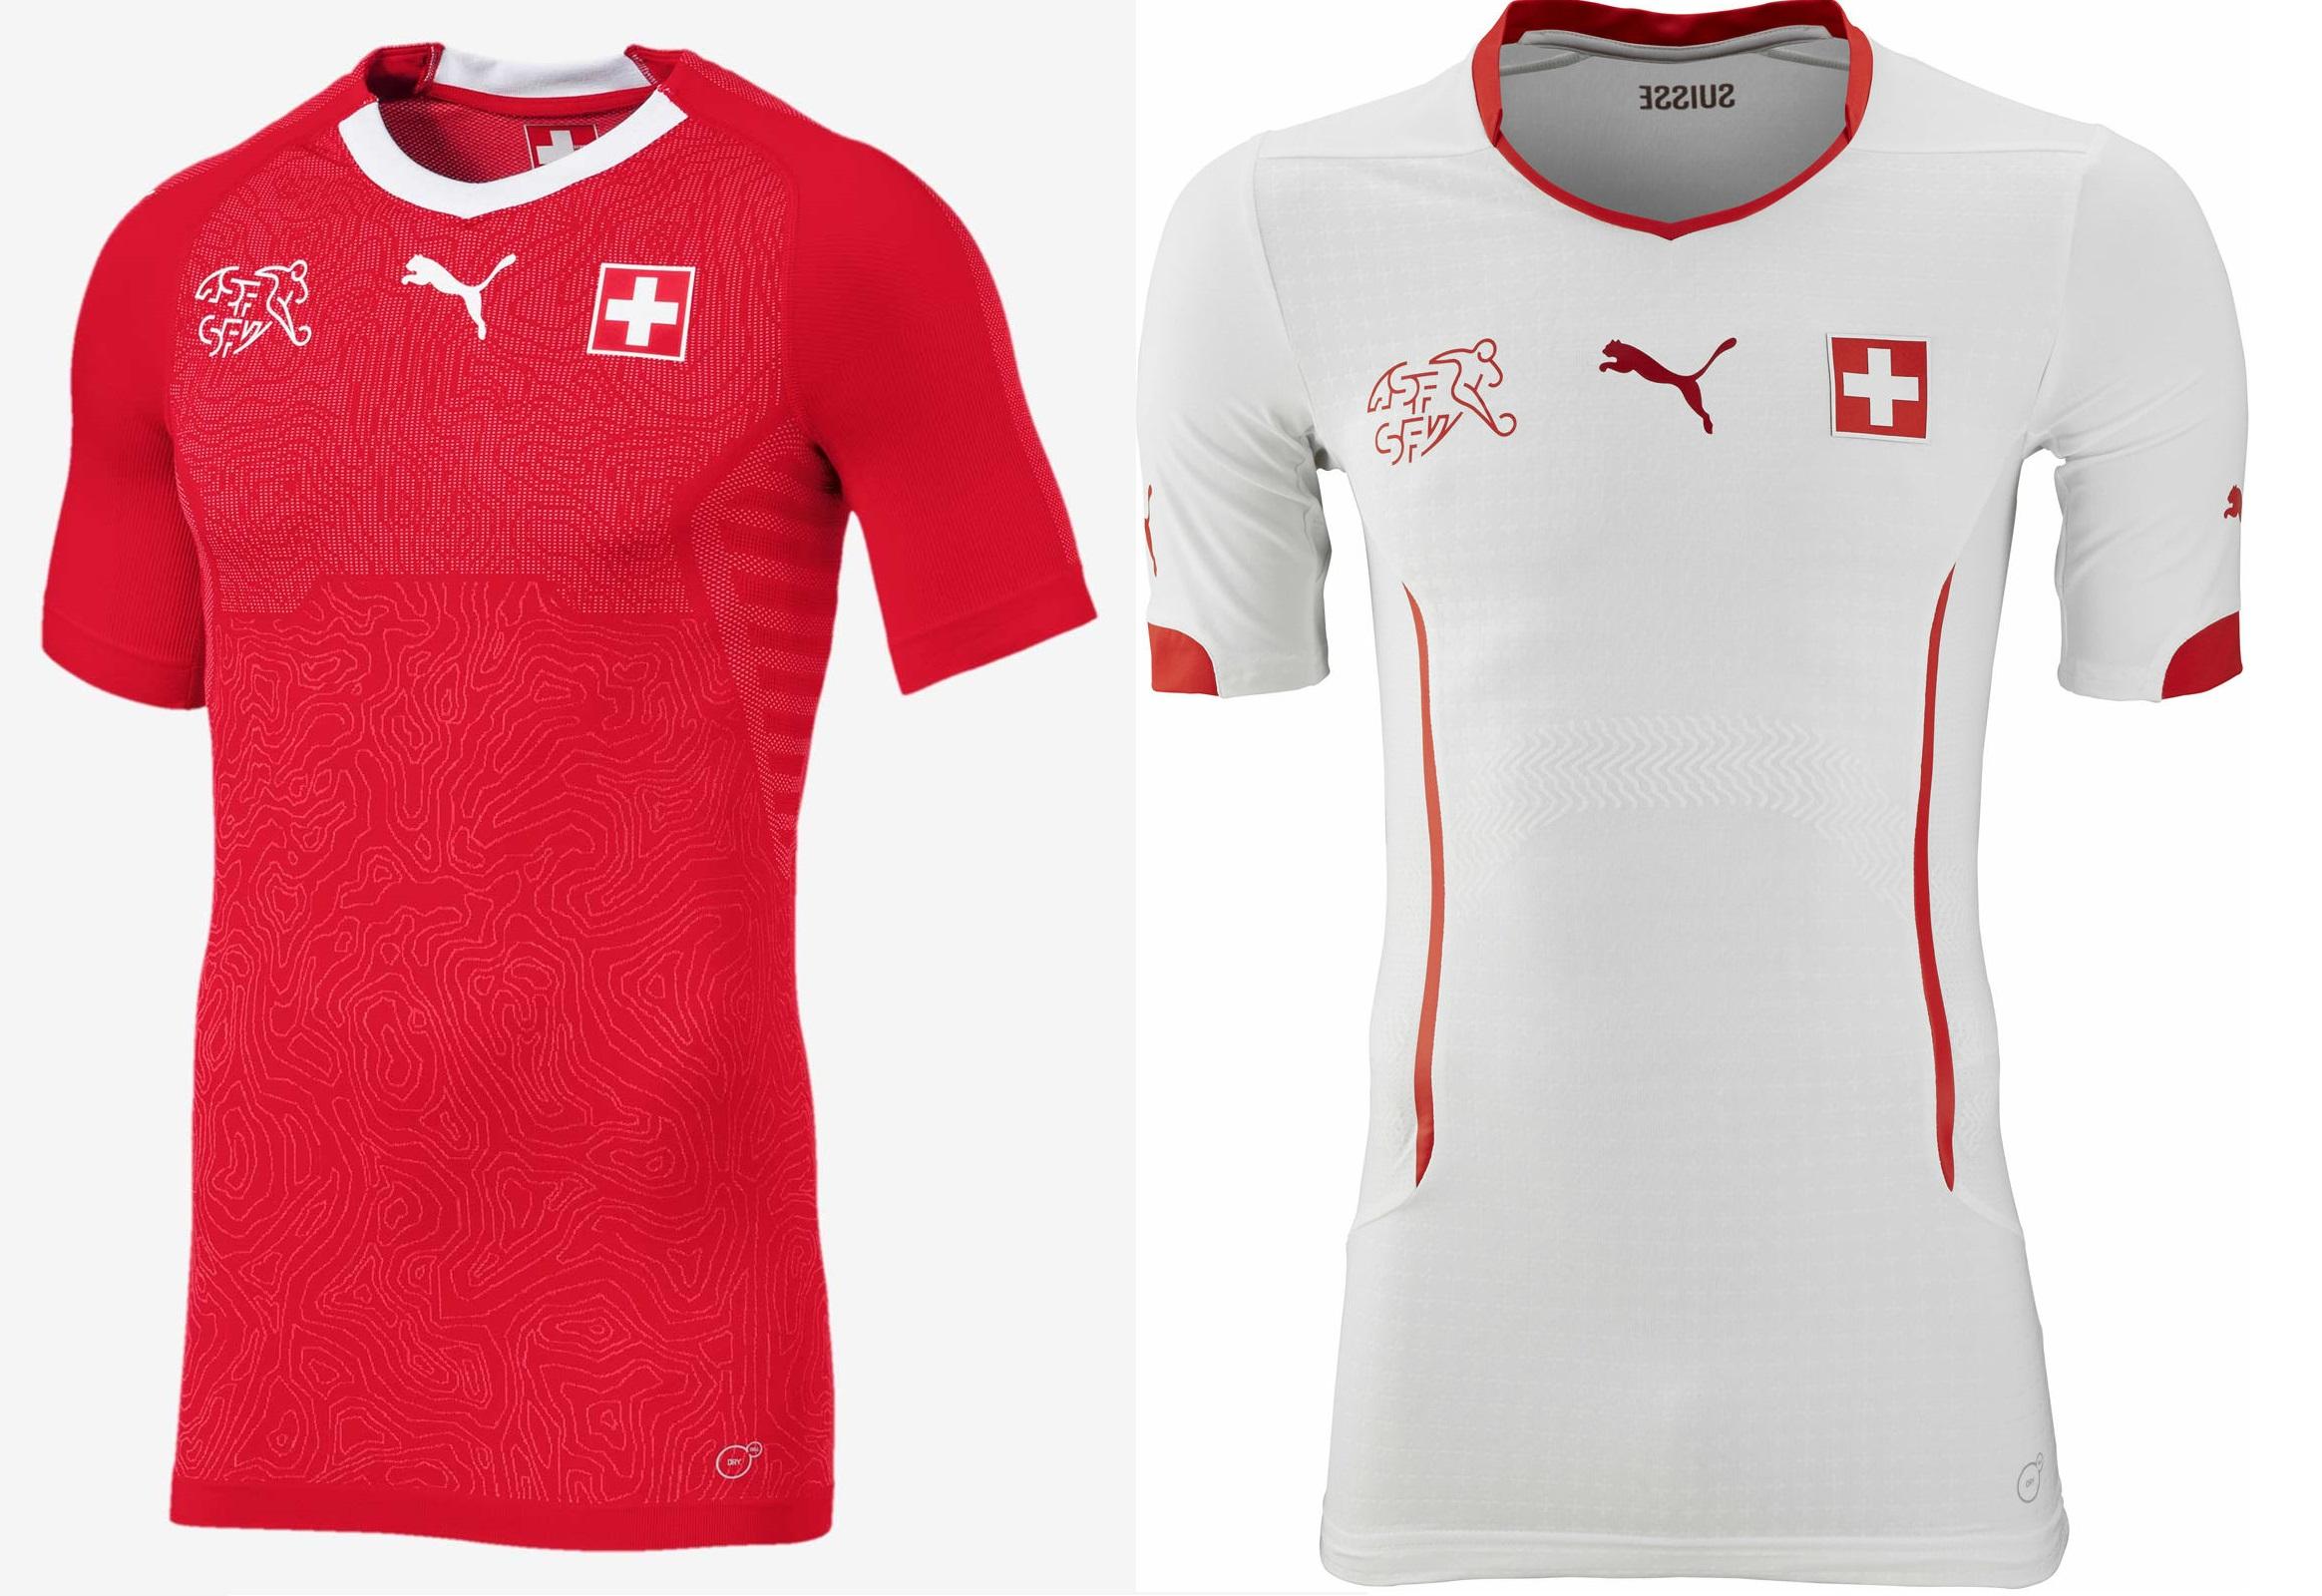 c1b1f3557f067 Camisetas de Suiza (PUMA).